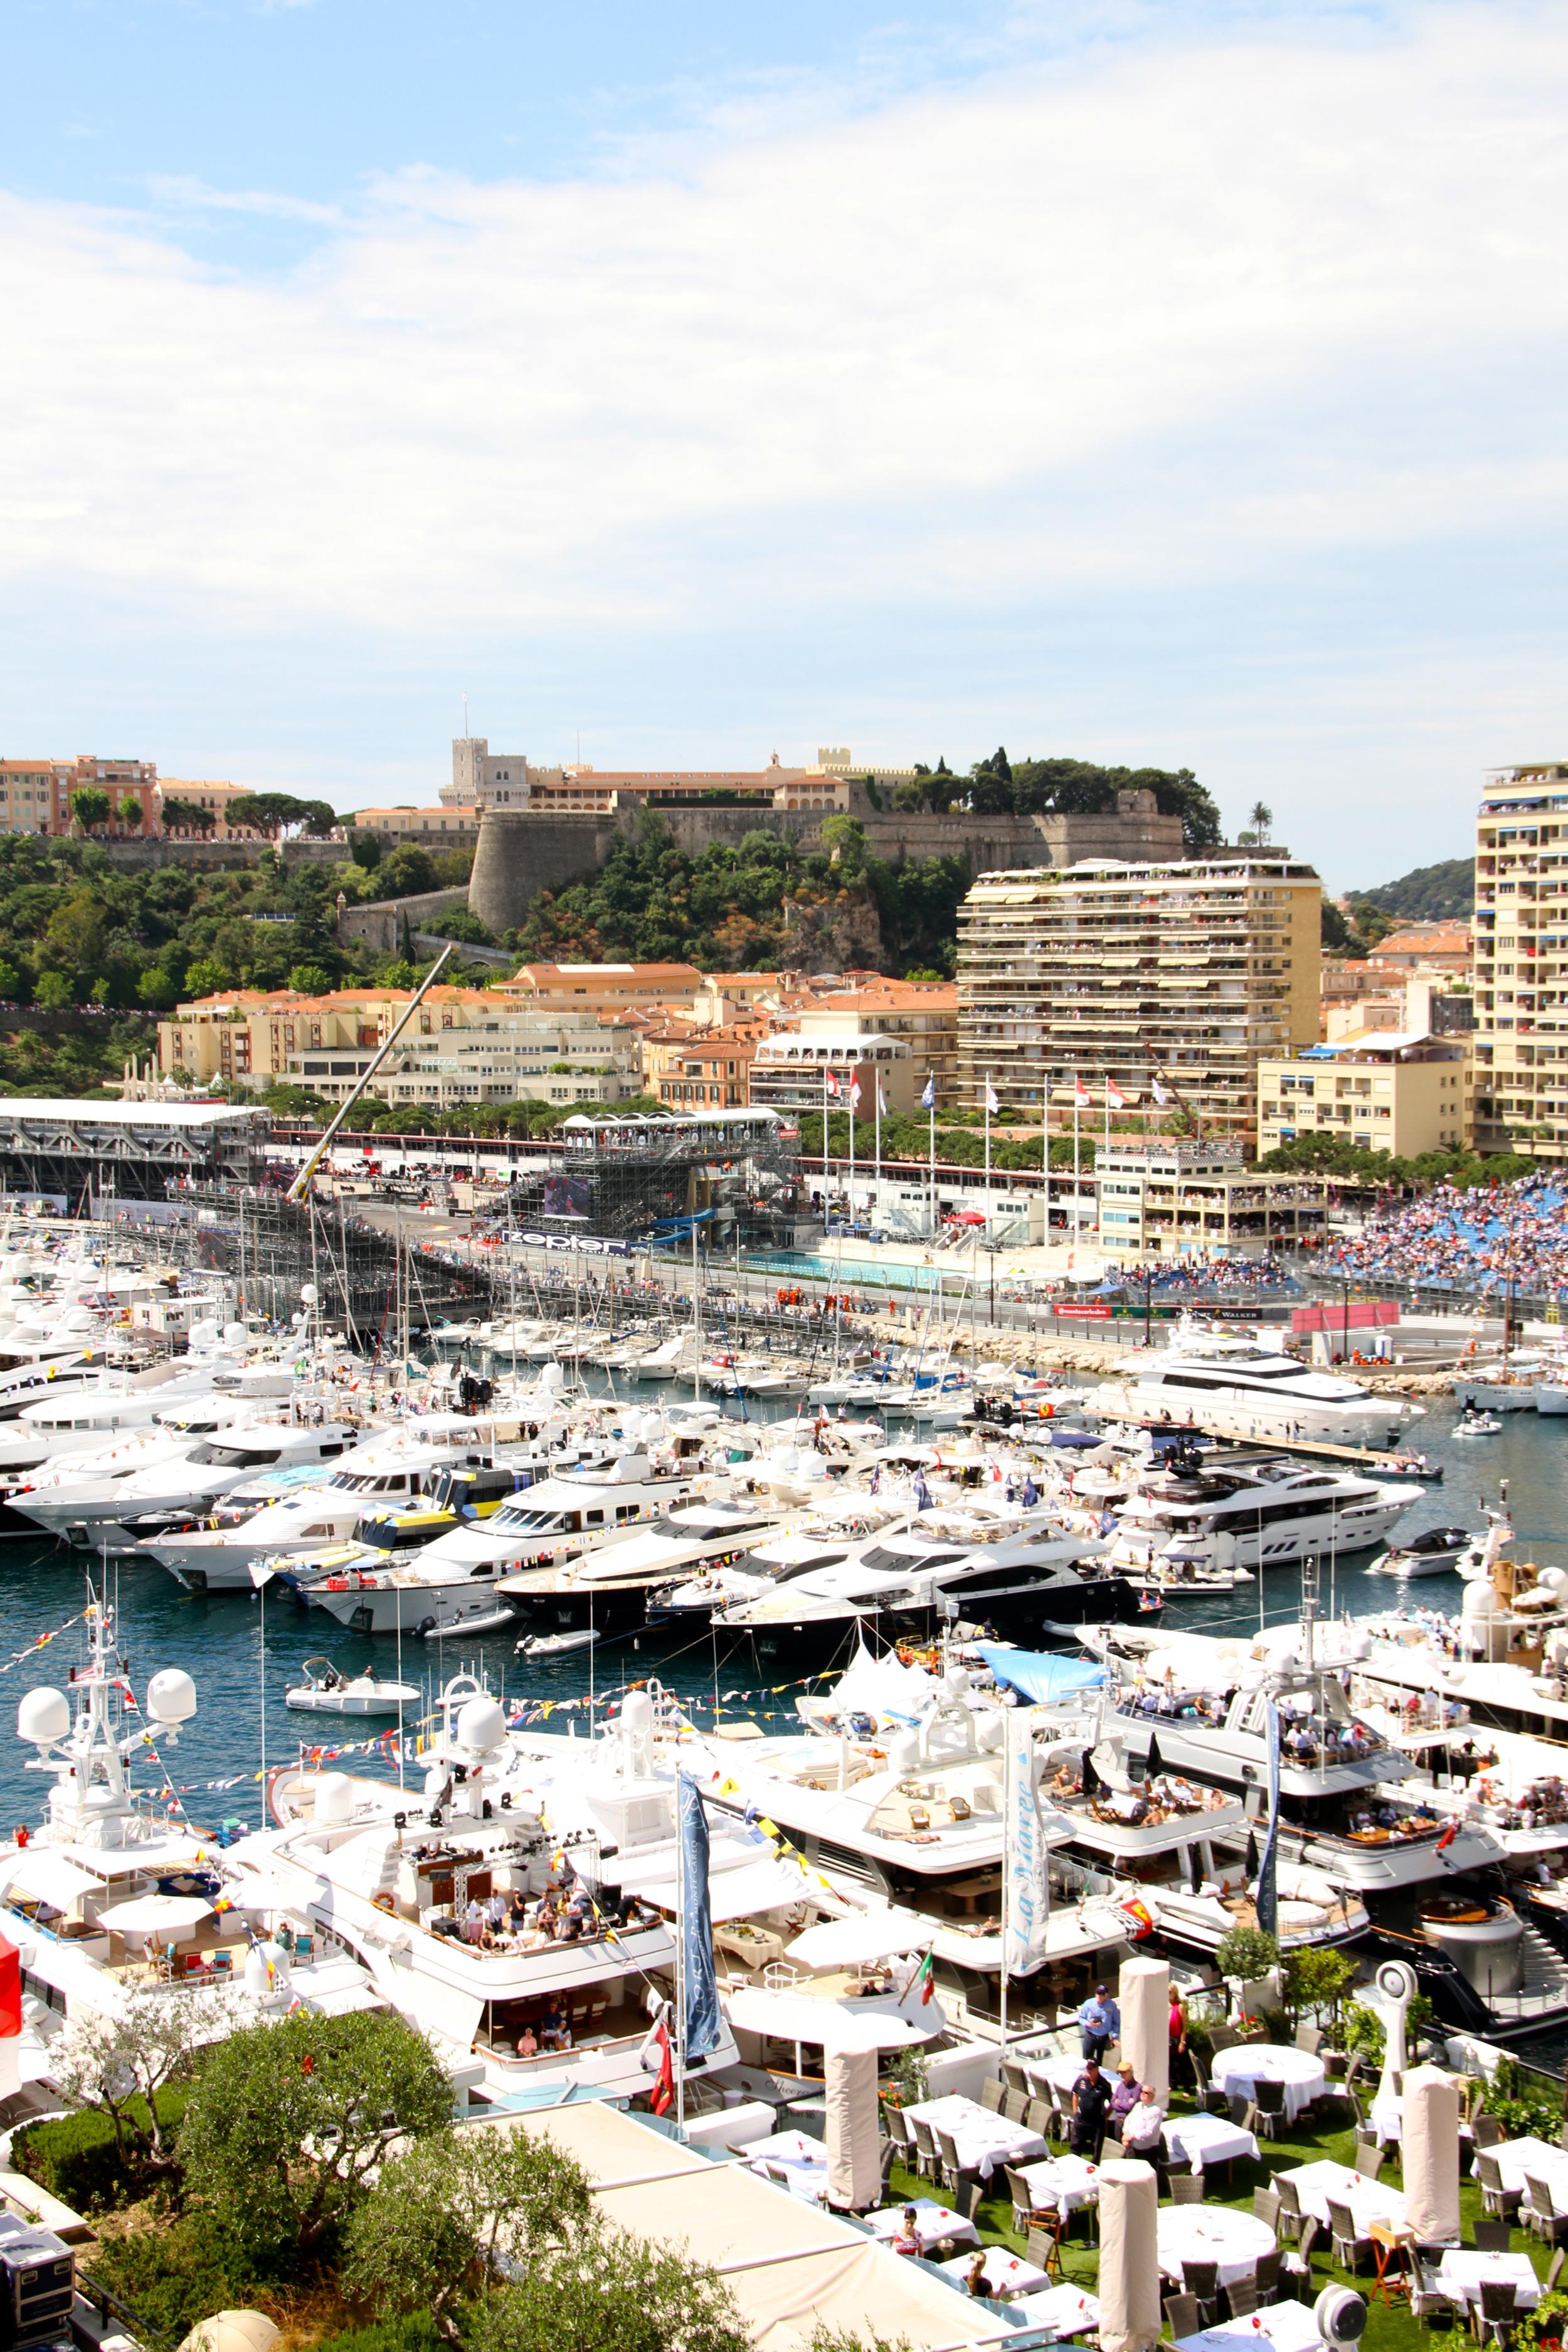 Super Yachts in Monaco Harbour